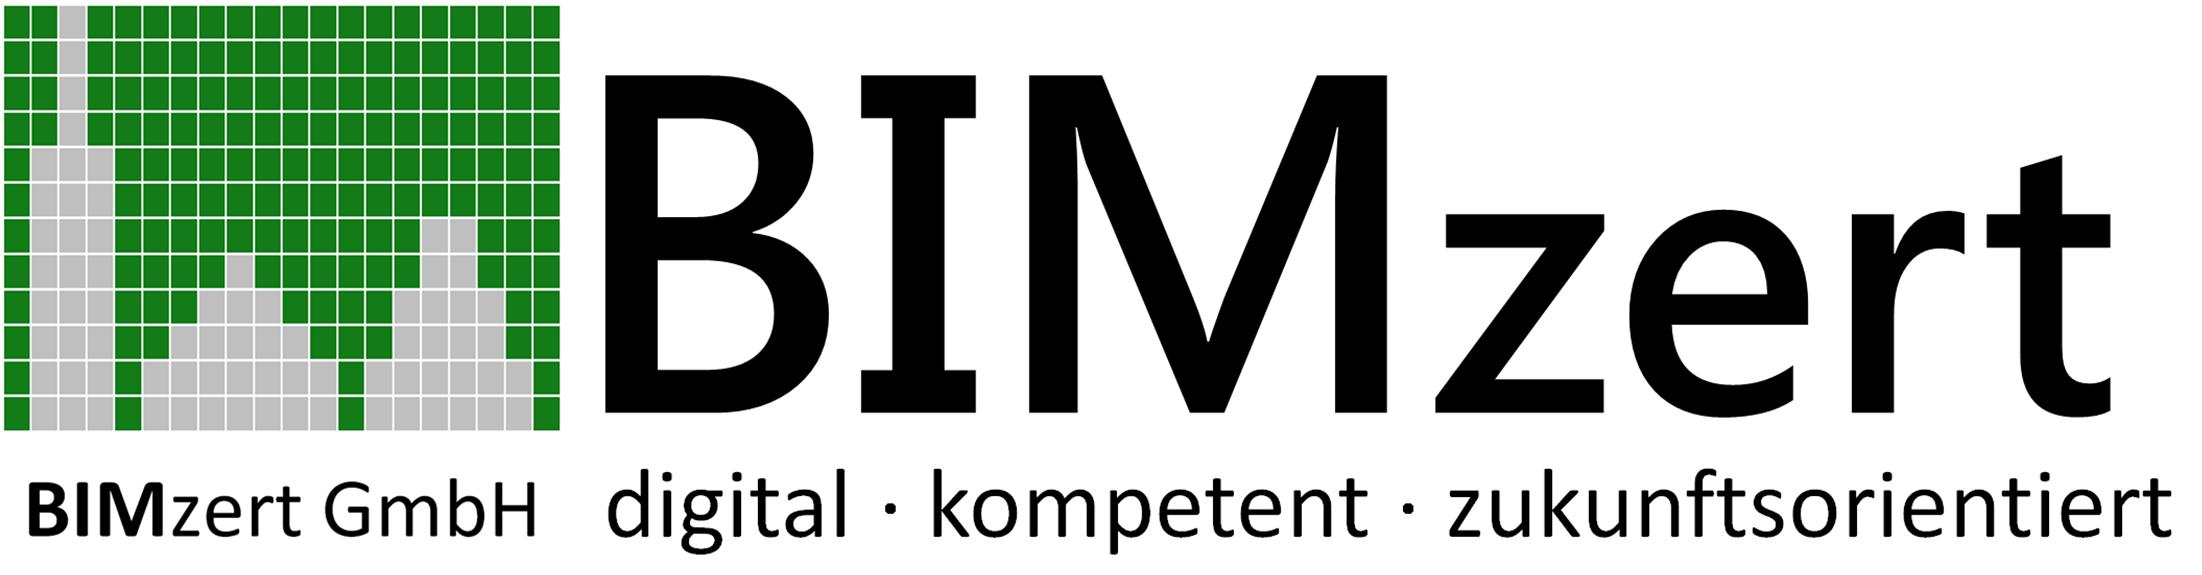 BIMzert GmbH